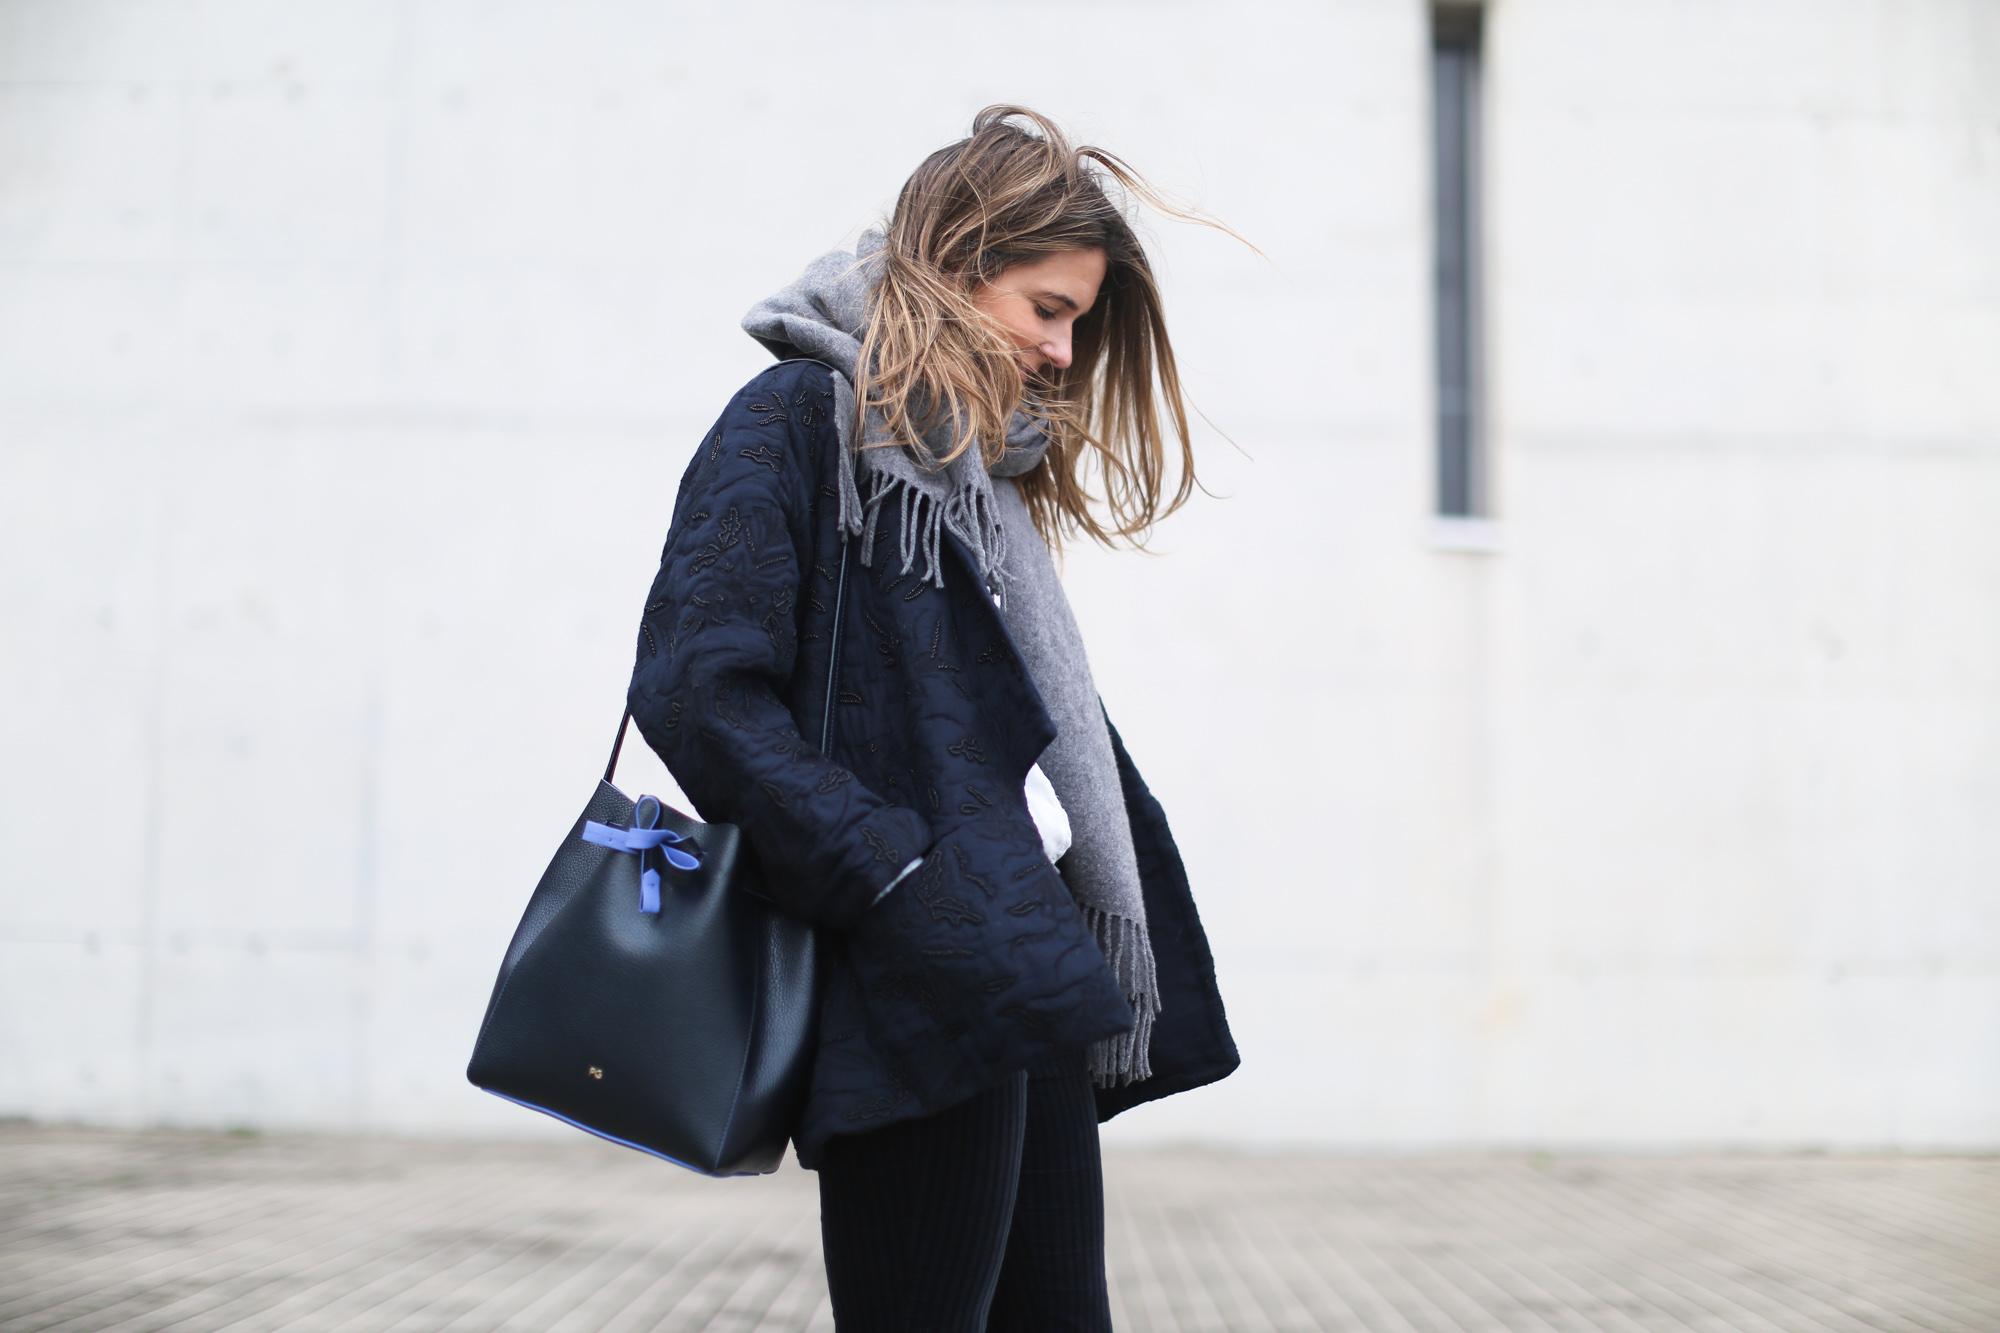 clochet_streetstyle_embroided_kimono_jacket_purificacion_garcia_bucket_bag-7